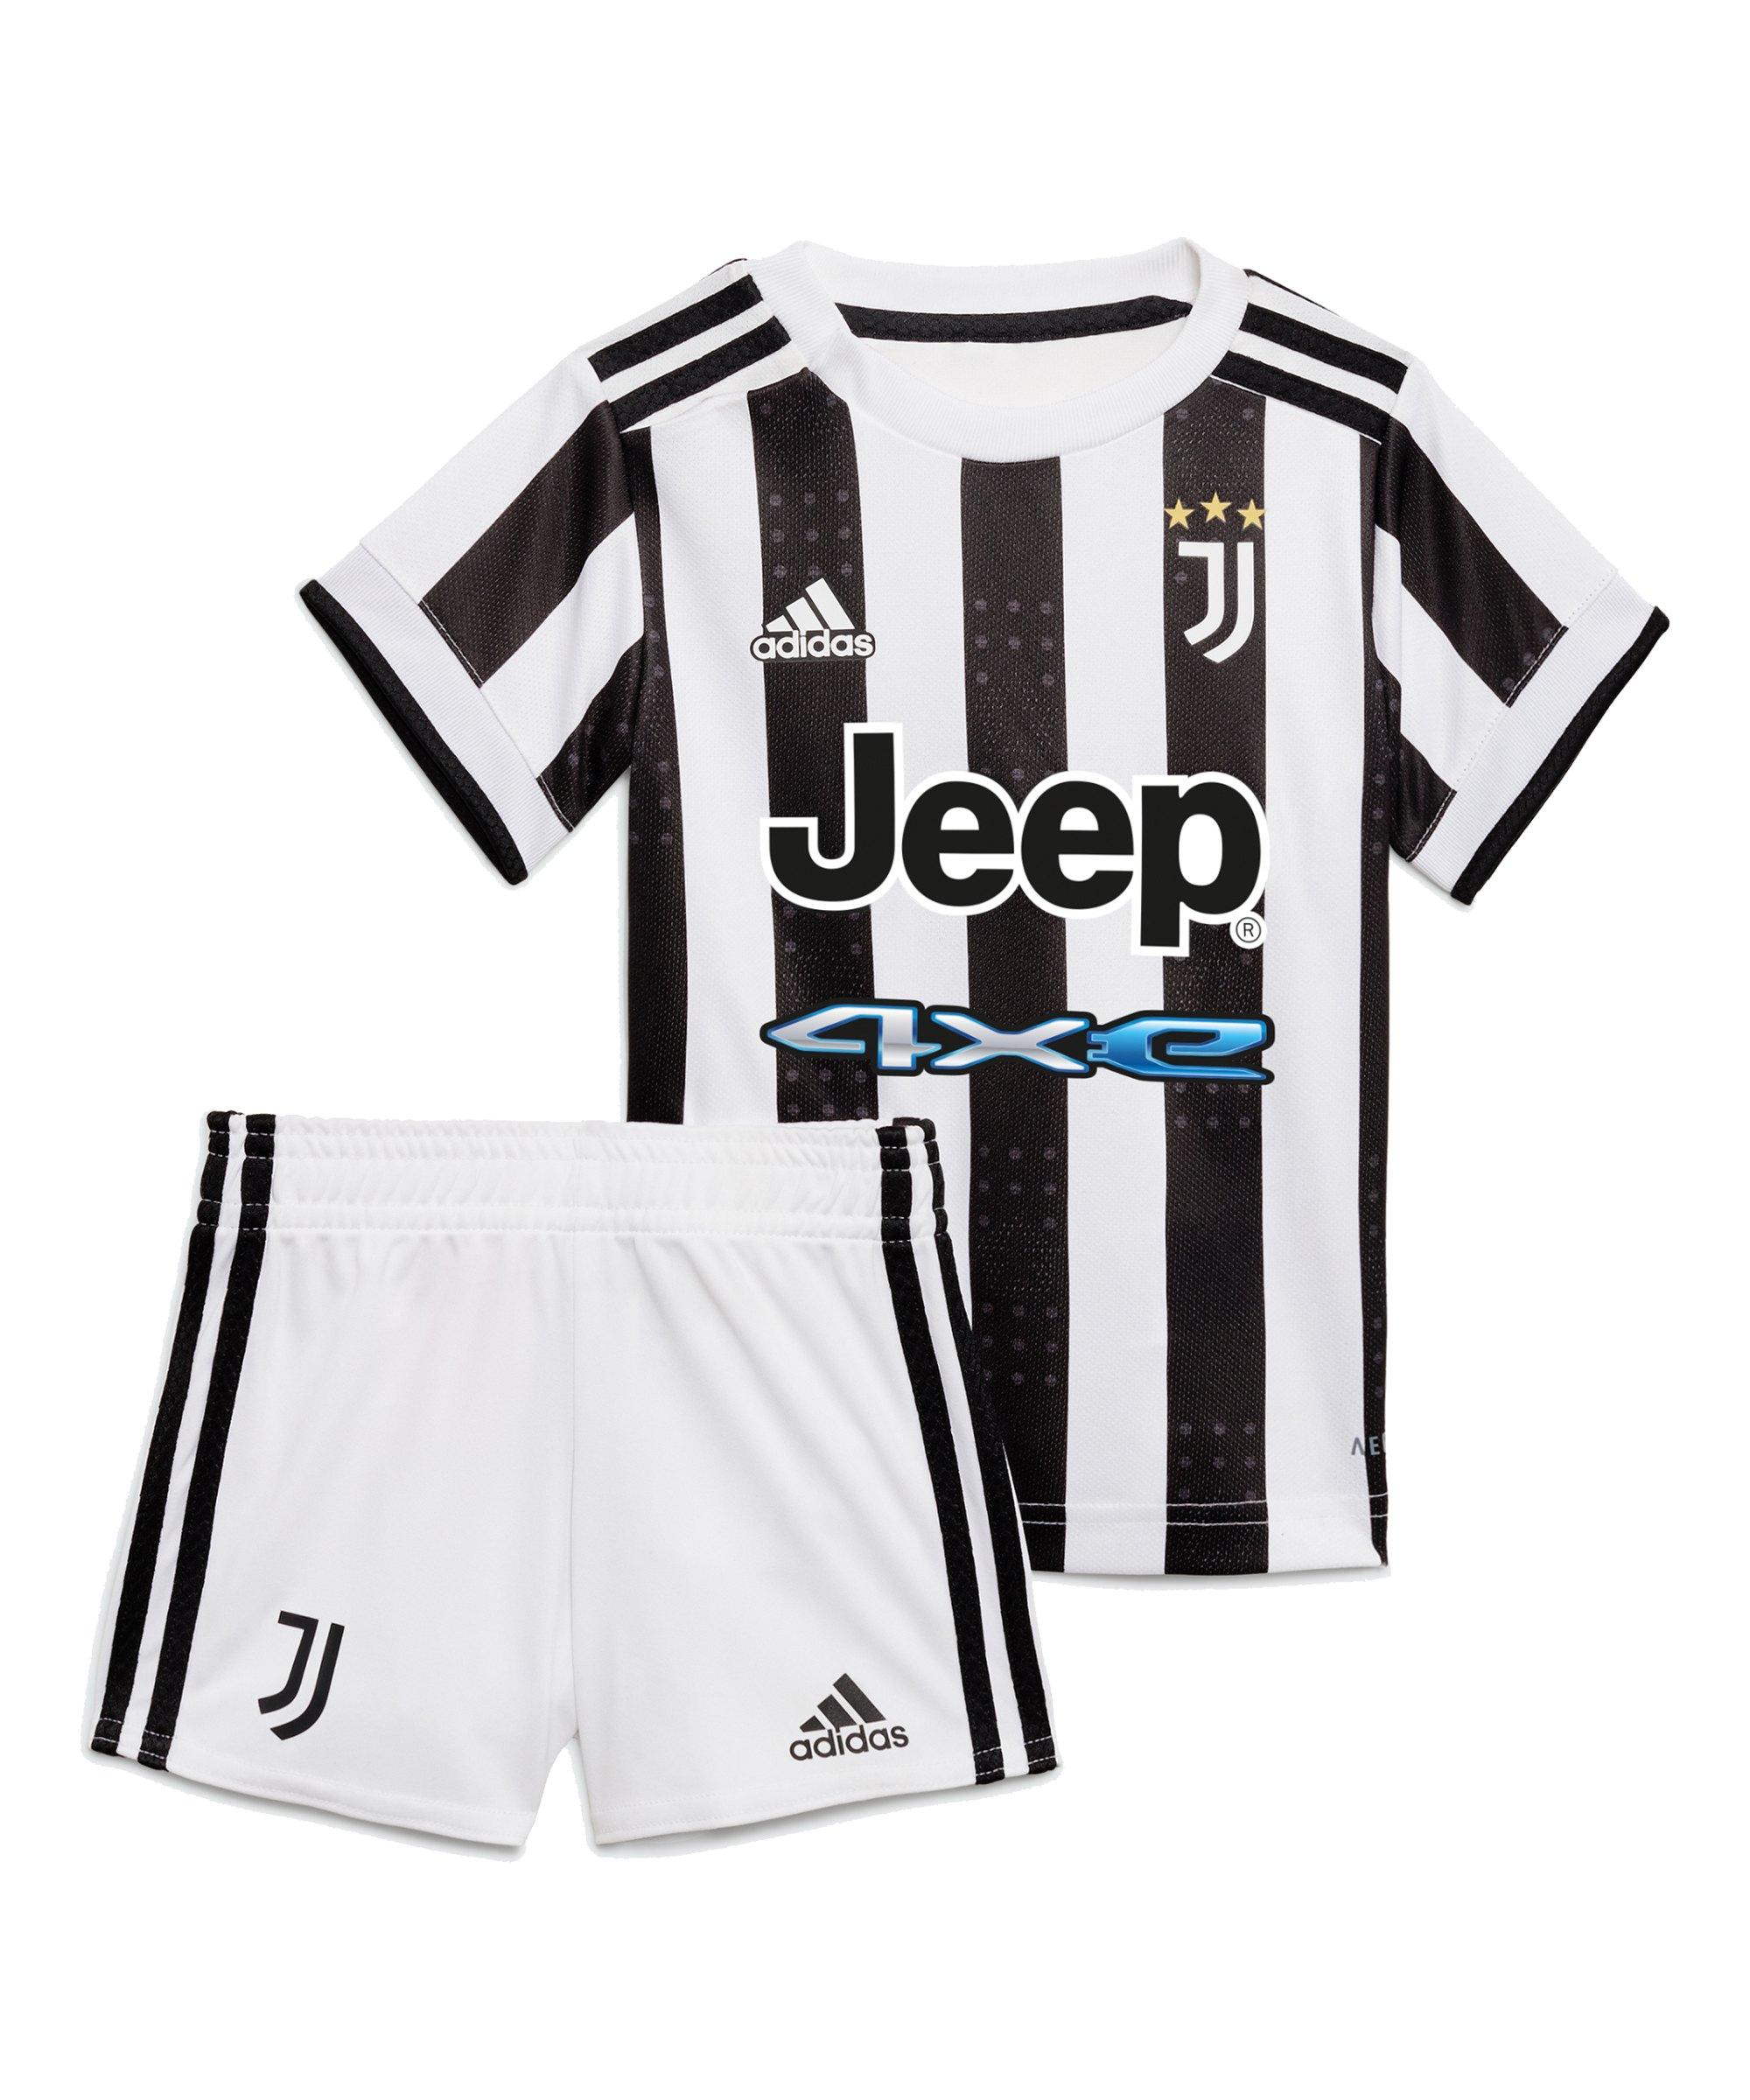 adidas Juventus Turin Babykit Home 2021/2022 Weiss Schwarz - weiss